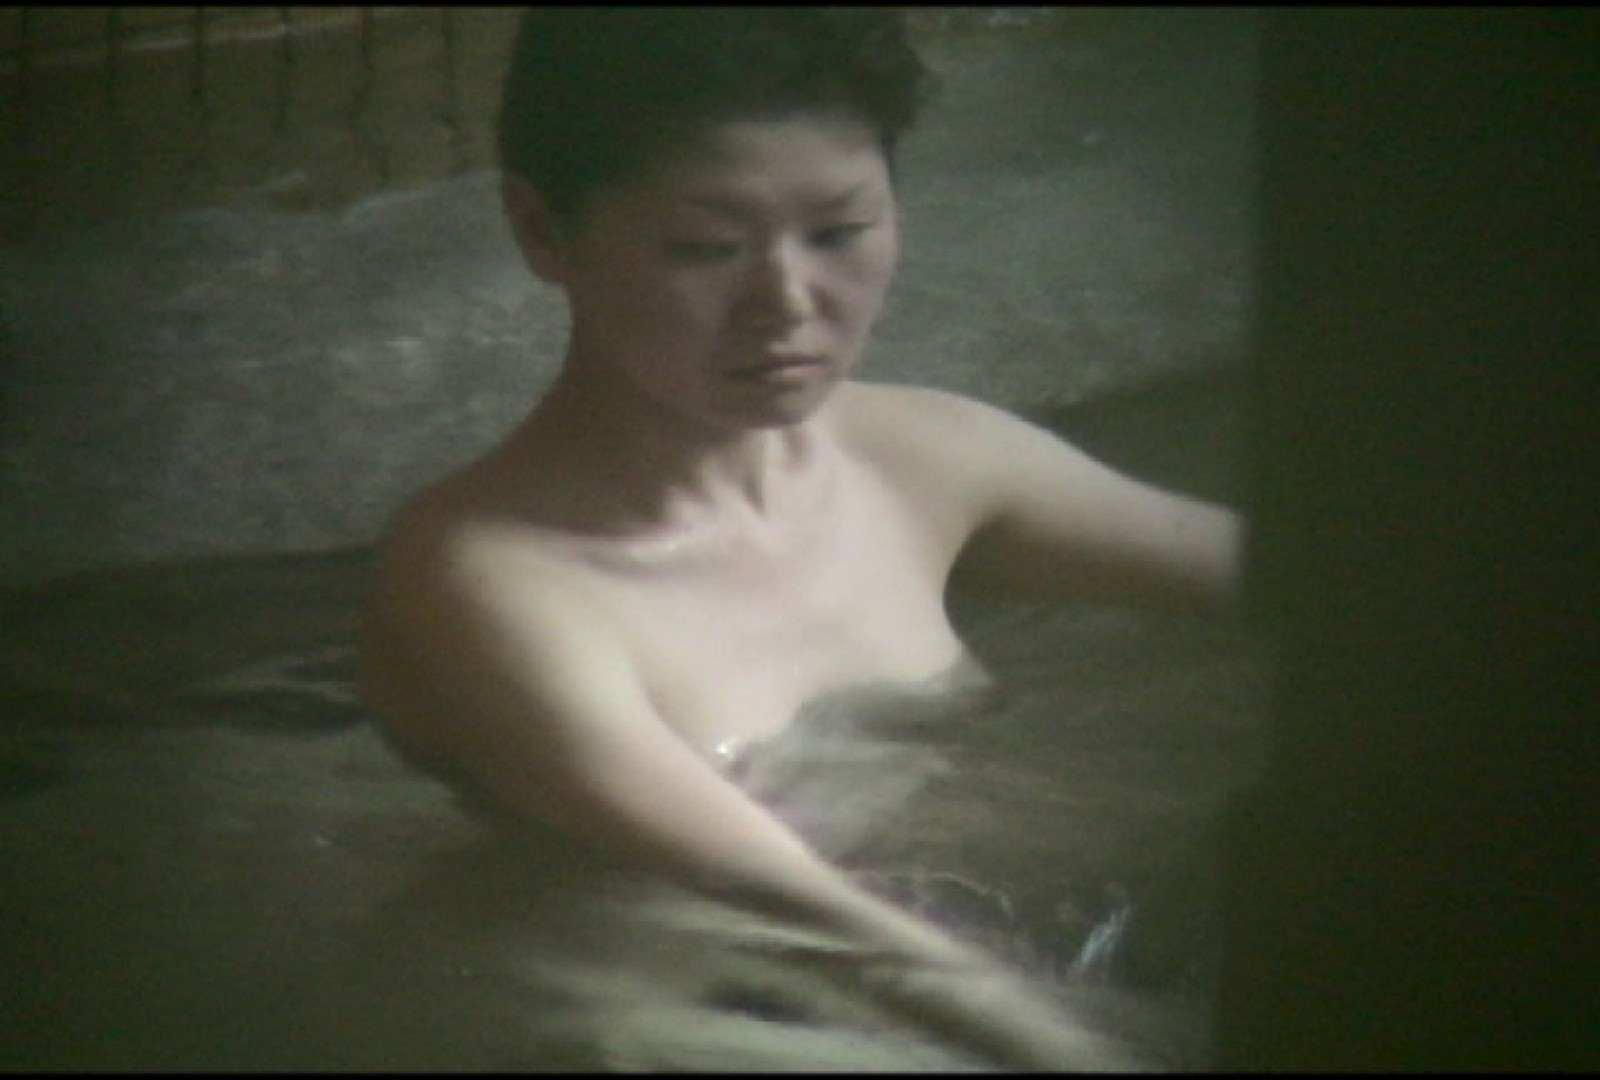 Aquaな露天風呂Vol.699 盗撮師作品 AV無料 101pic 47